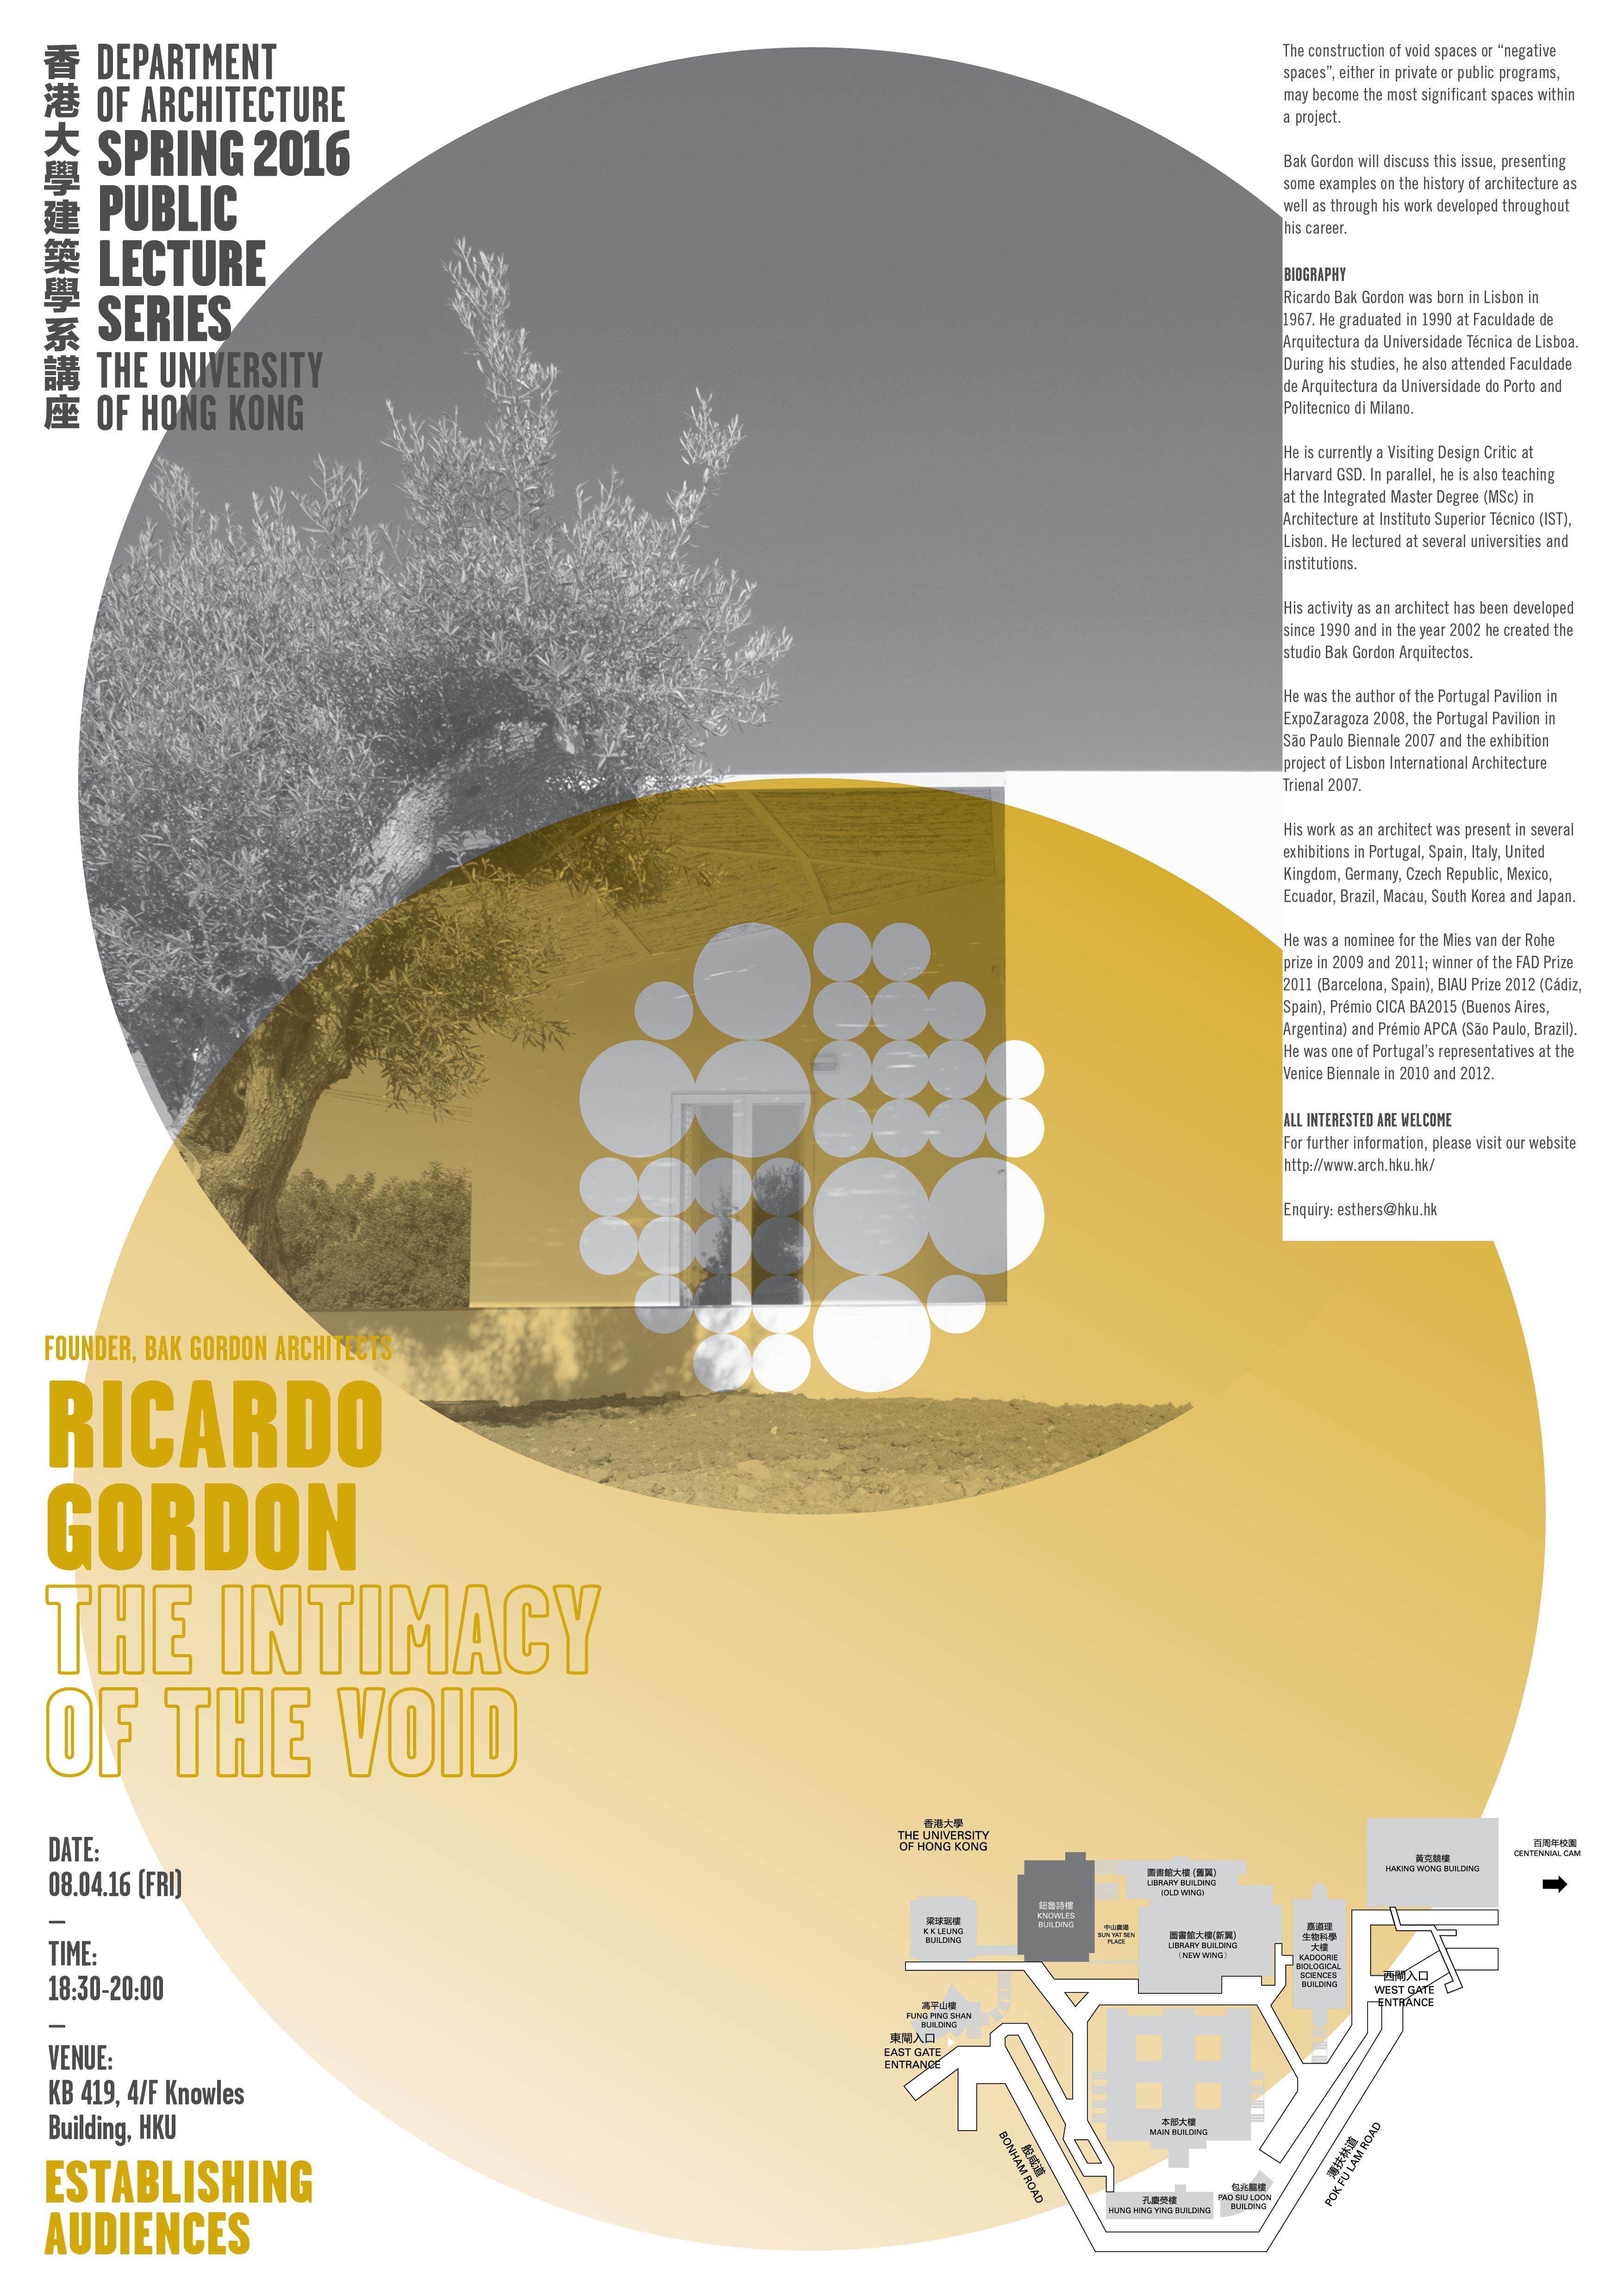 Ricardo Gordon